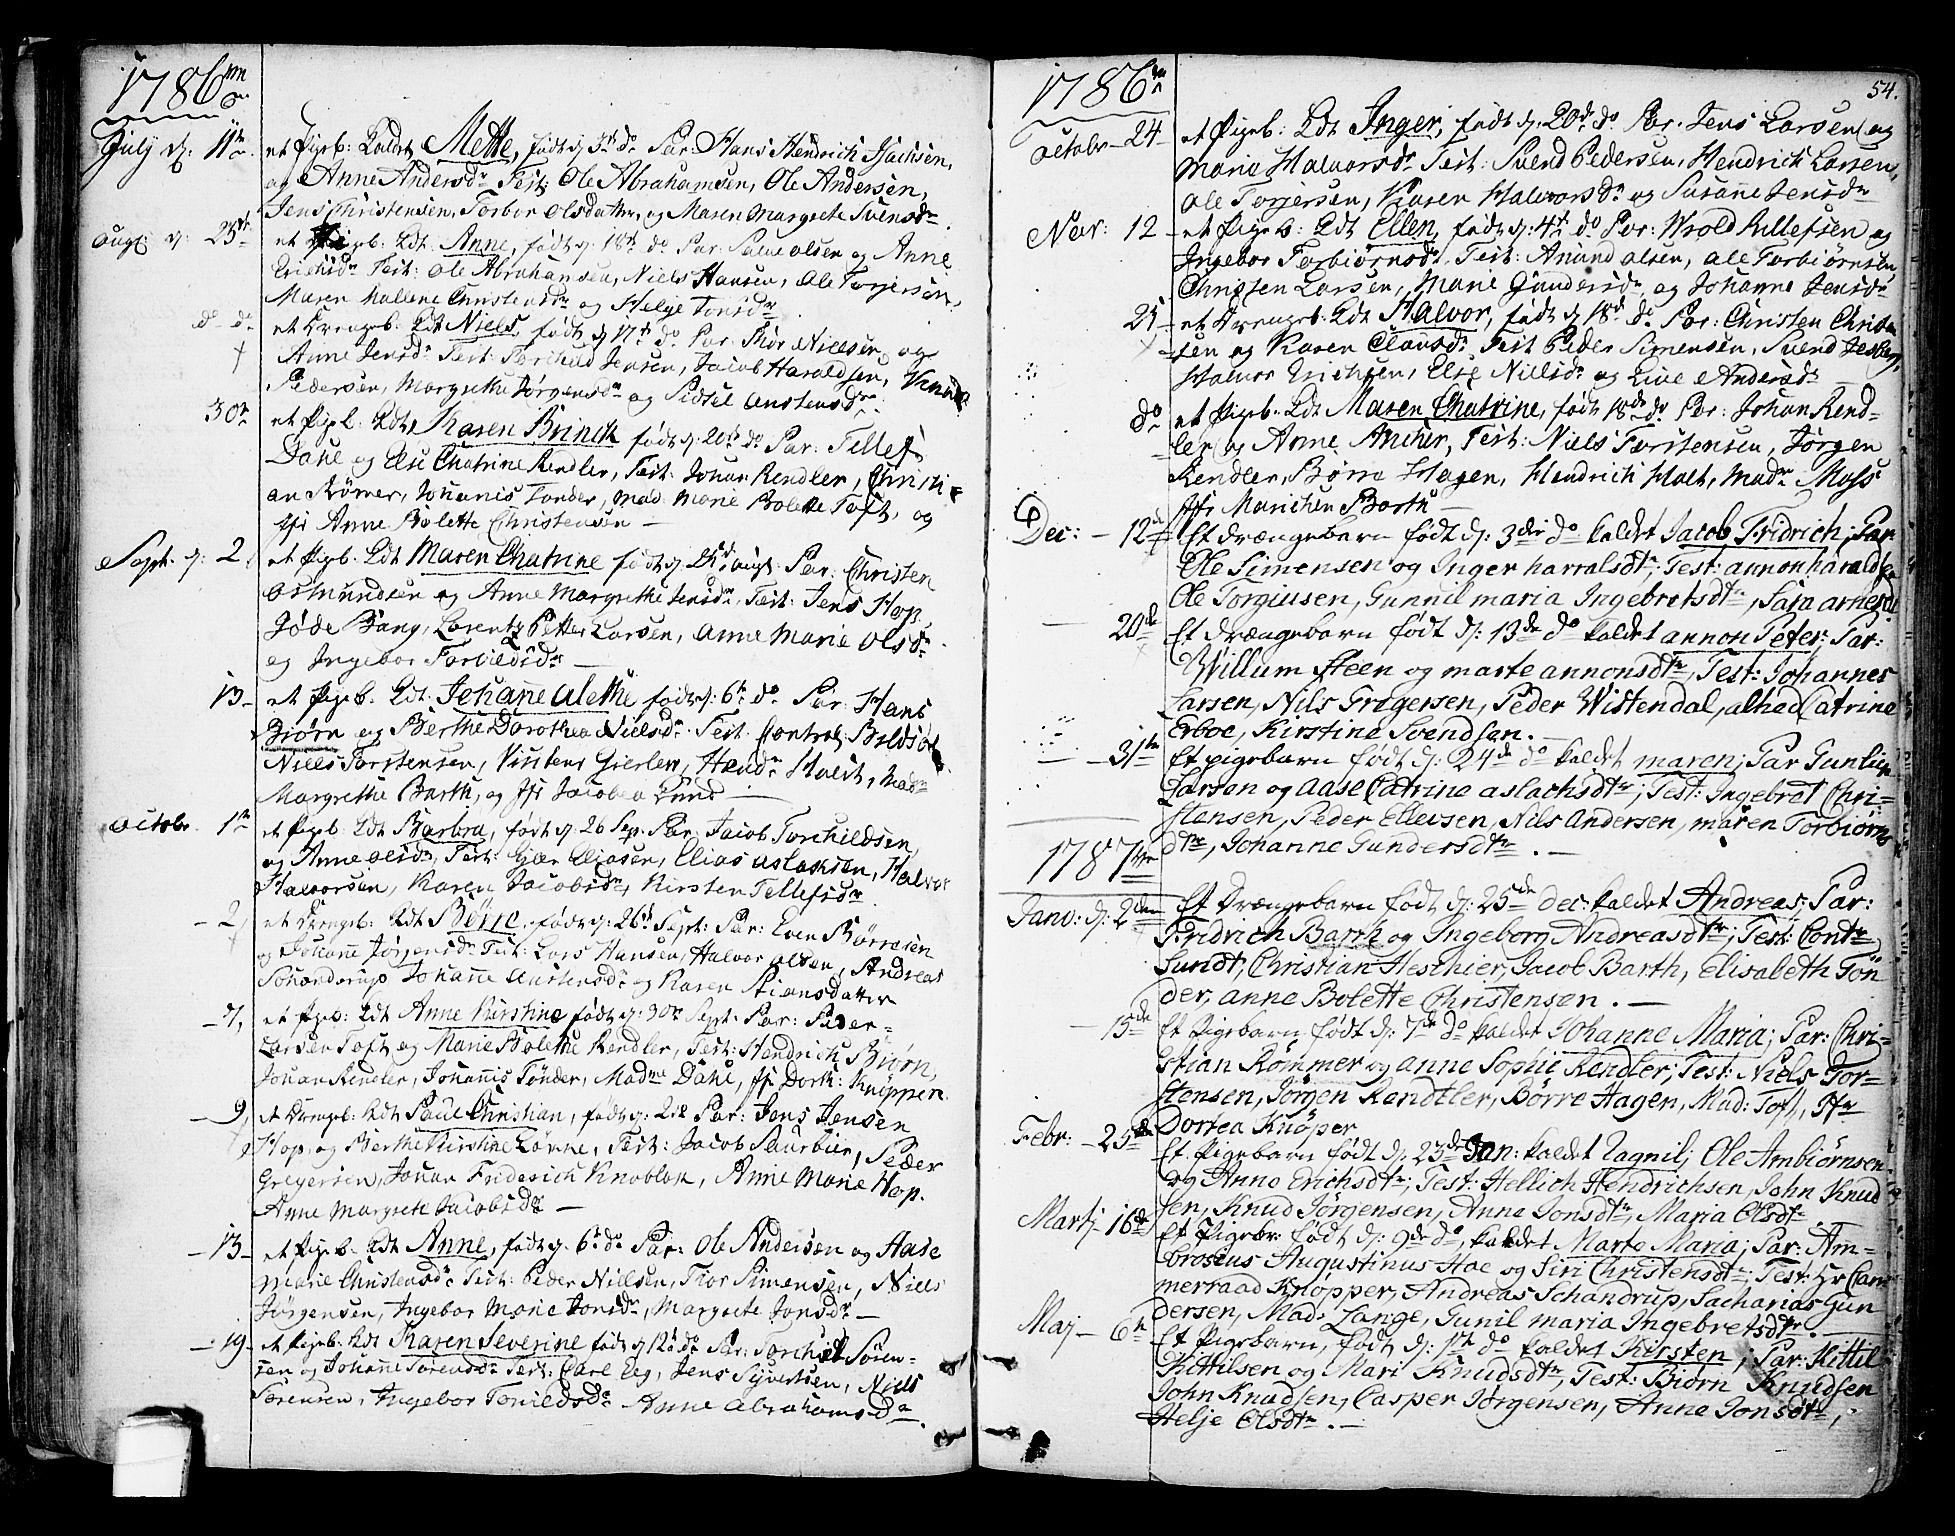 SAKO, Kragerø kirkebøker, F/Fa/L0002: Ministerialbok nr. 2, 1767-1802, s. 54